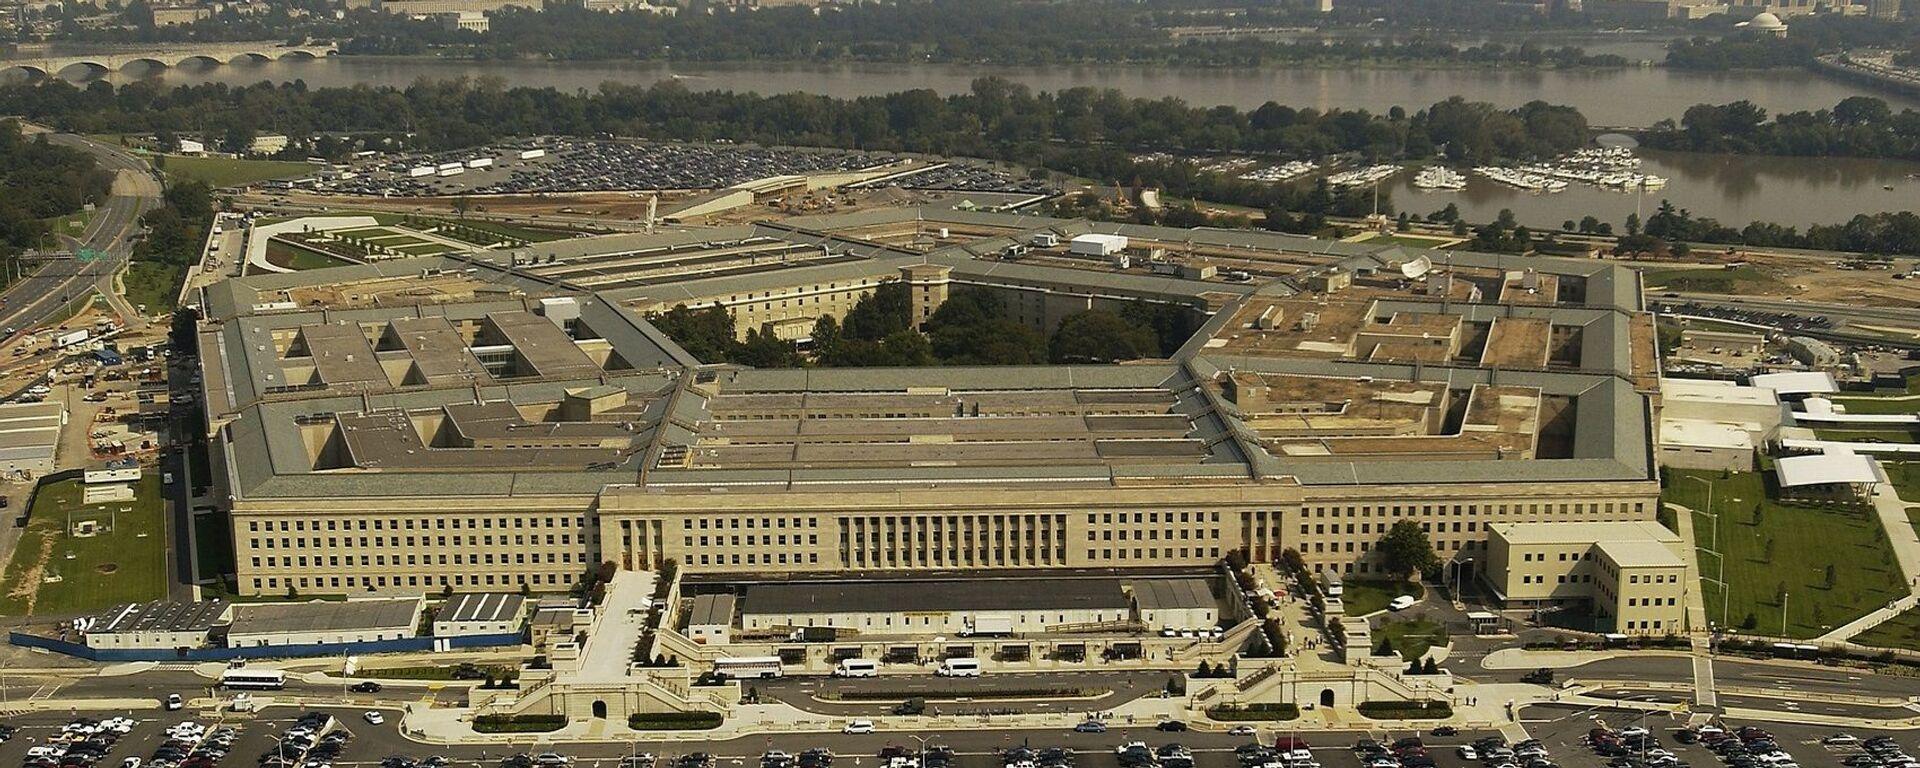 El Pentágono o Departamento de Defensa de Estados Unidos - Sputnik Mundo, 1920, 30.09.2021